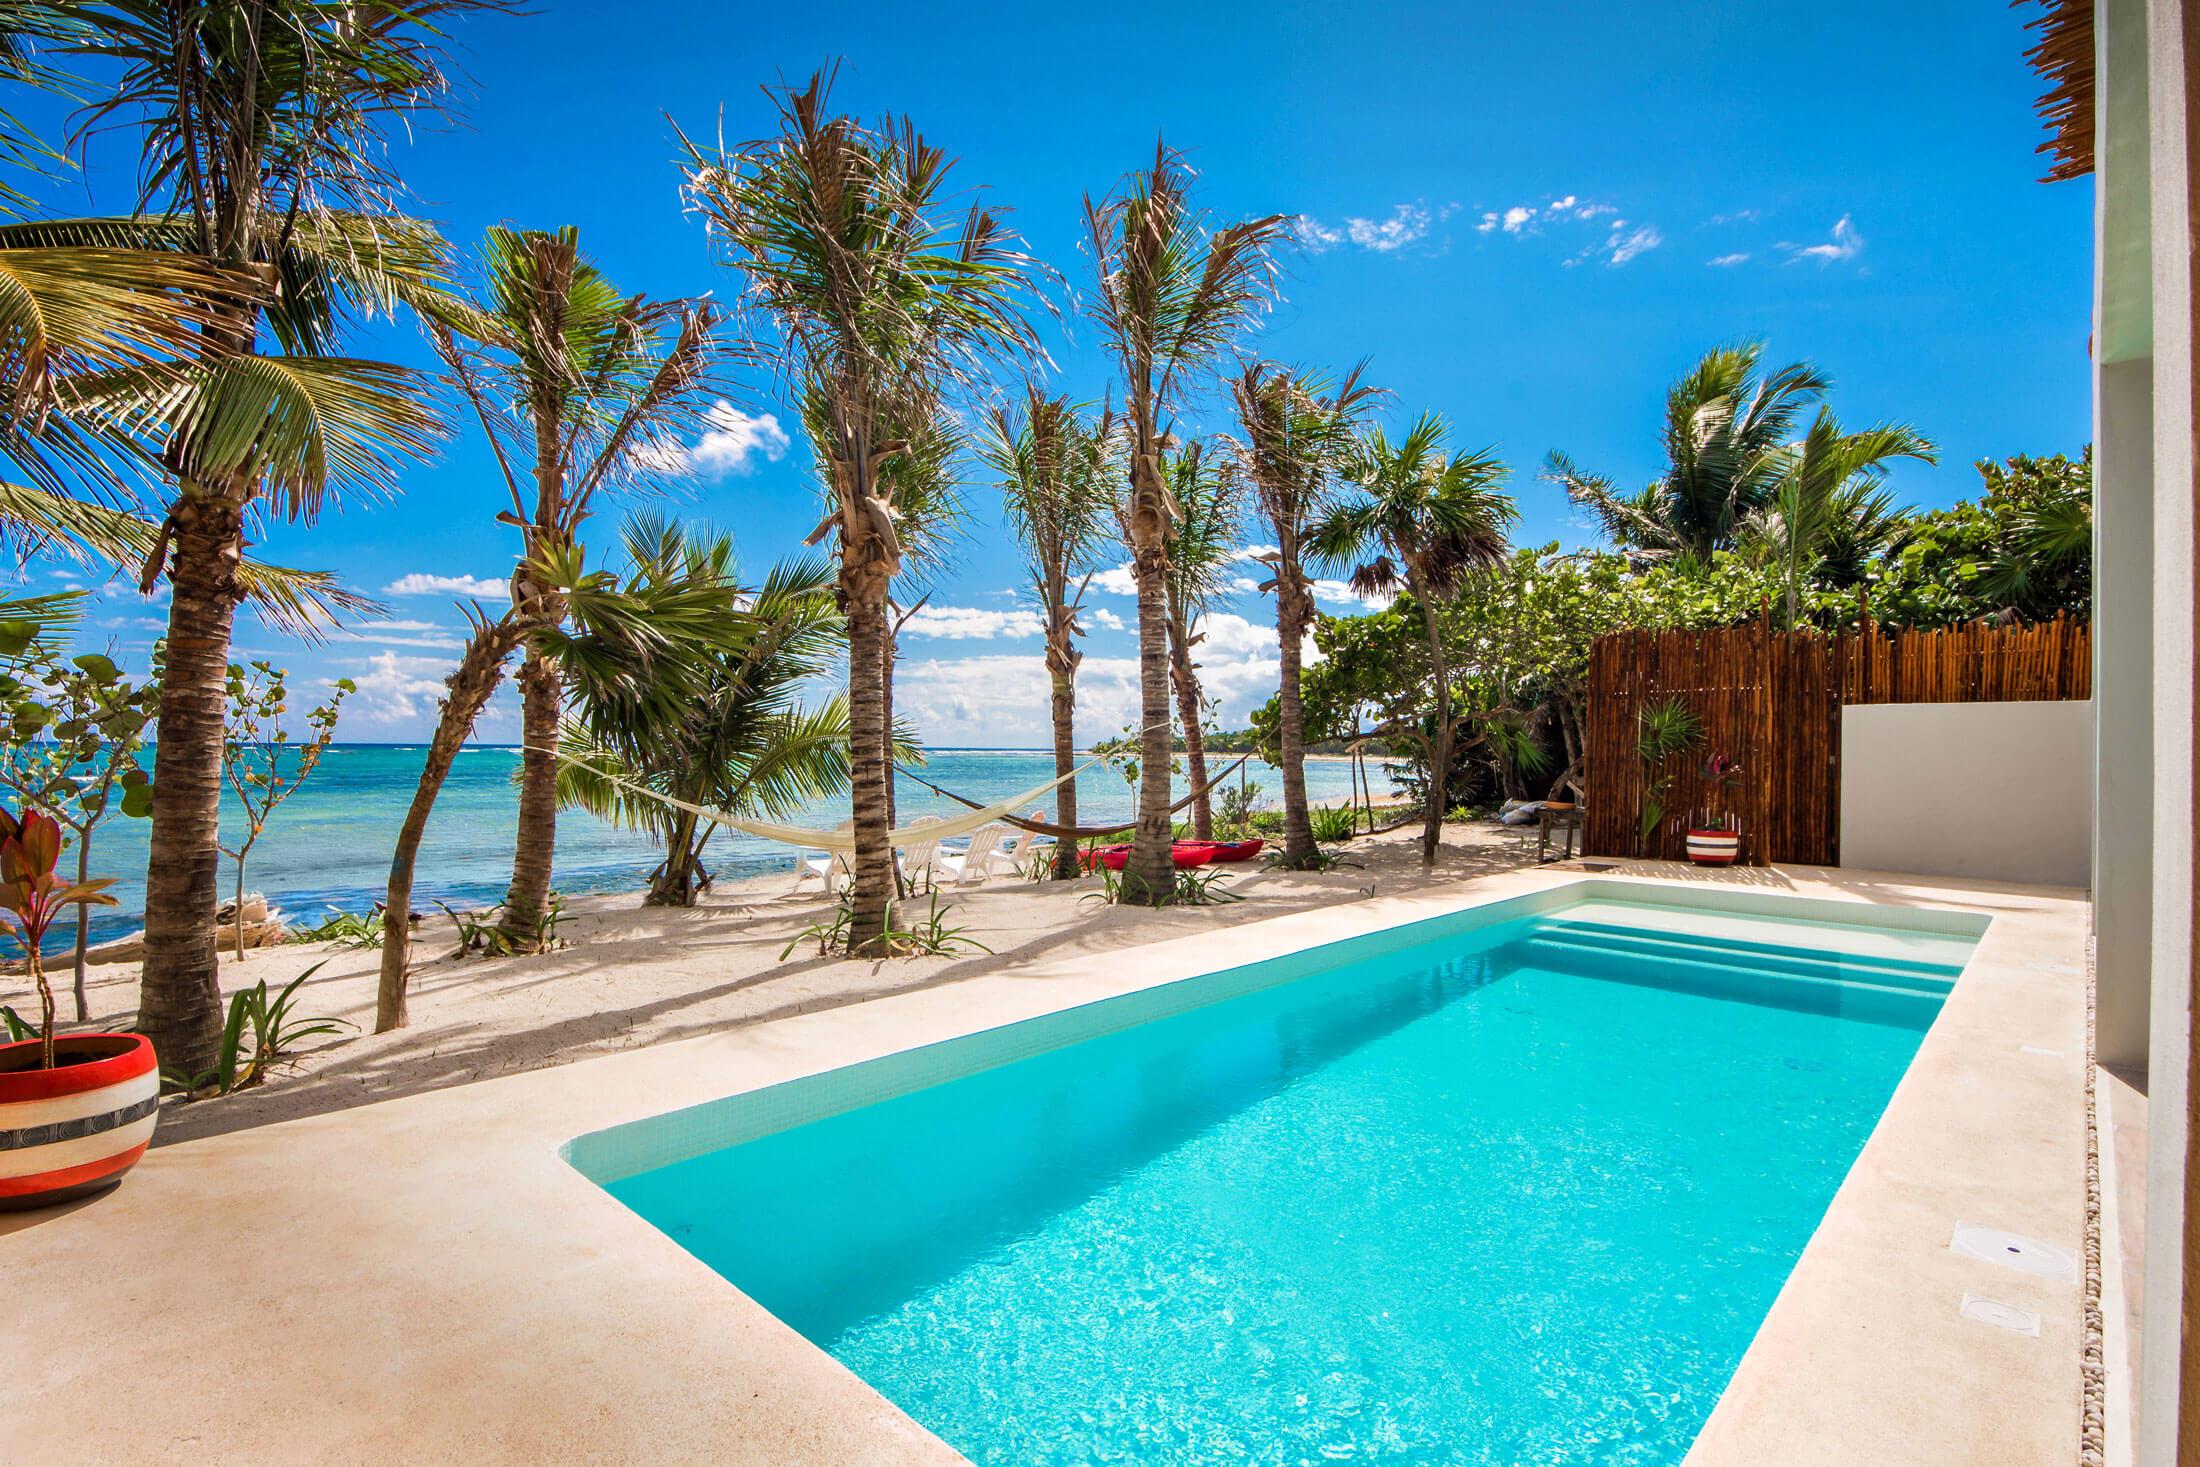 Maya_Luxe_Riviera_Maya_Luxury_Villas_Experiences_Tulum_Soliman_Bay_5_Bedrooms_0.jpg